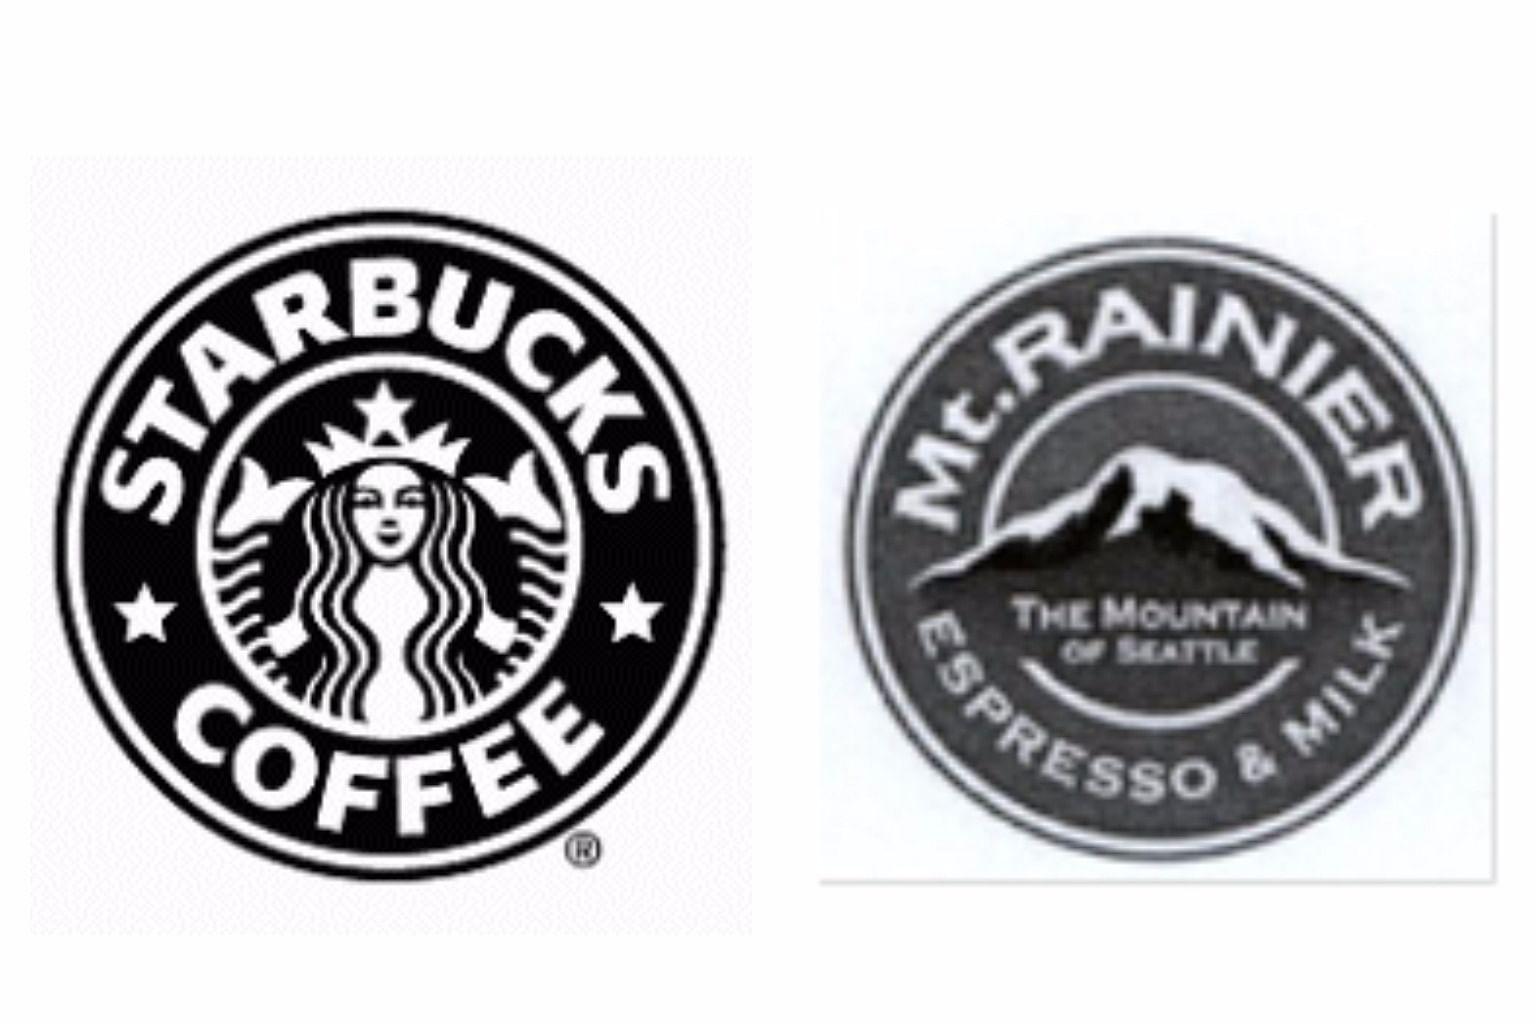 Starbucks Loses Trademark Lawsuit To Morinaga Milk Over Mountain